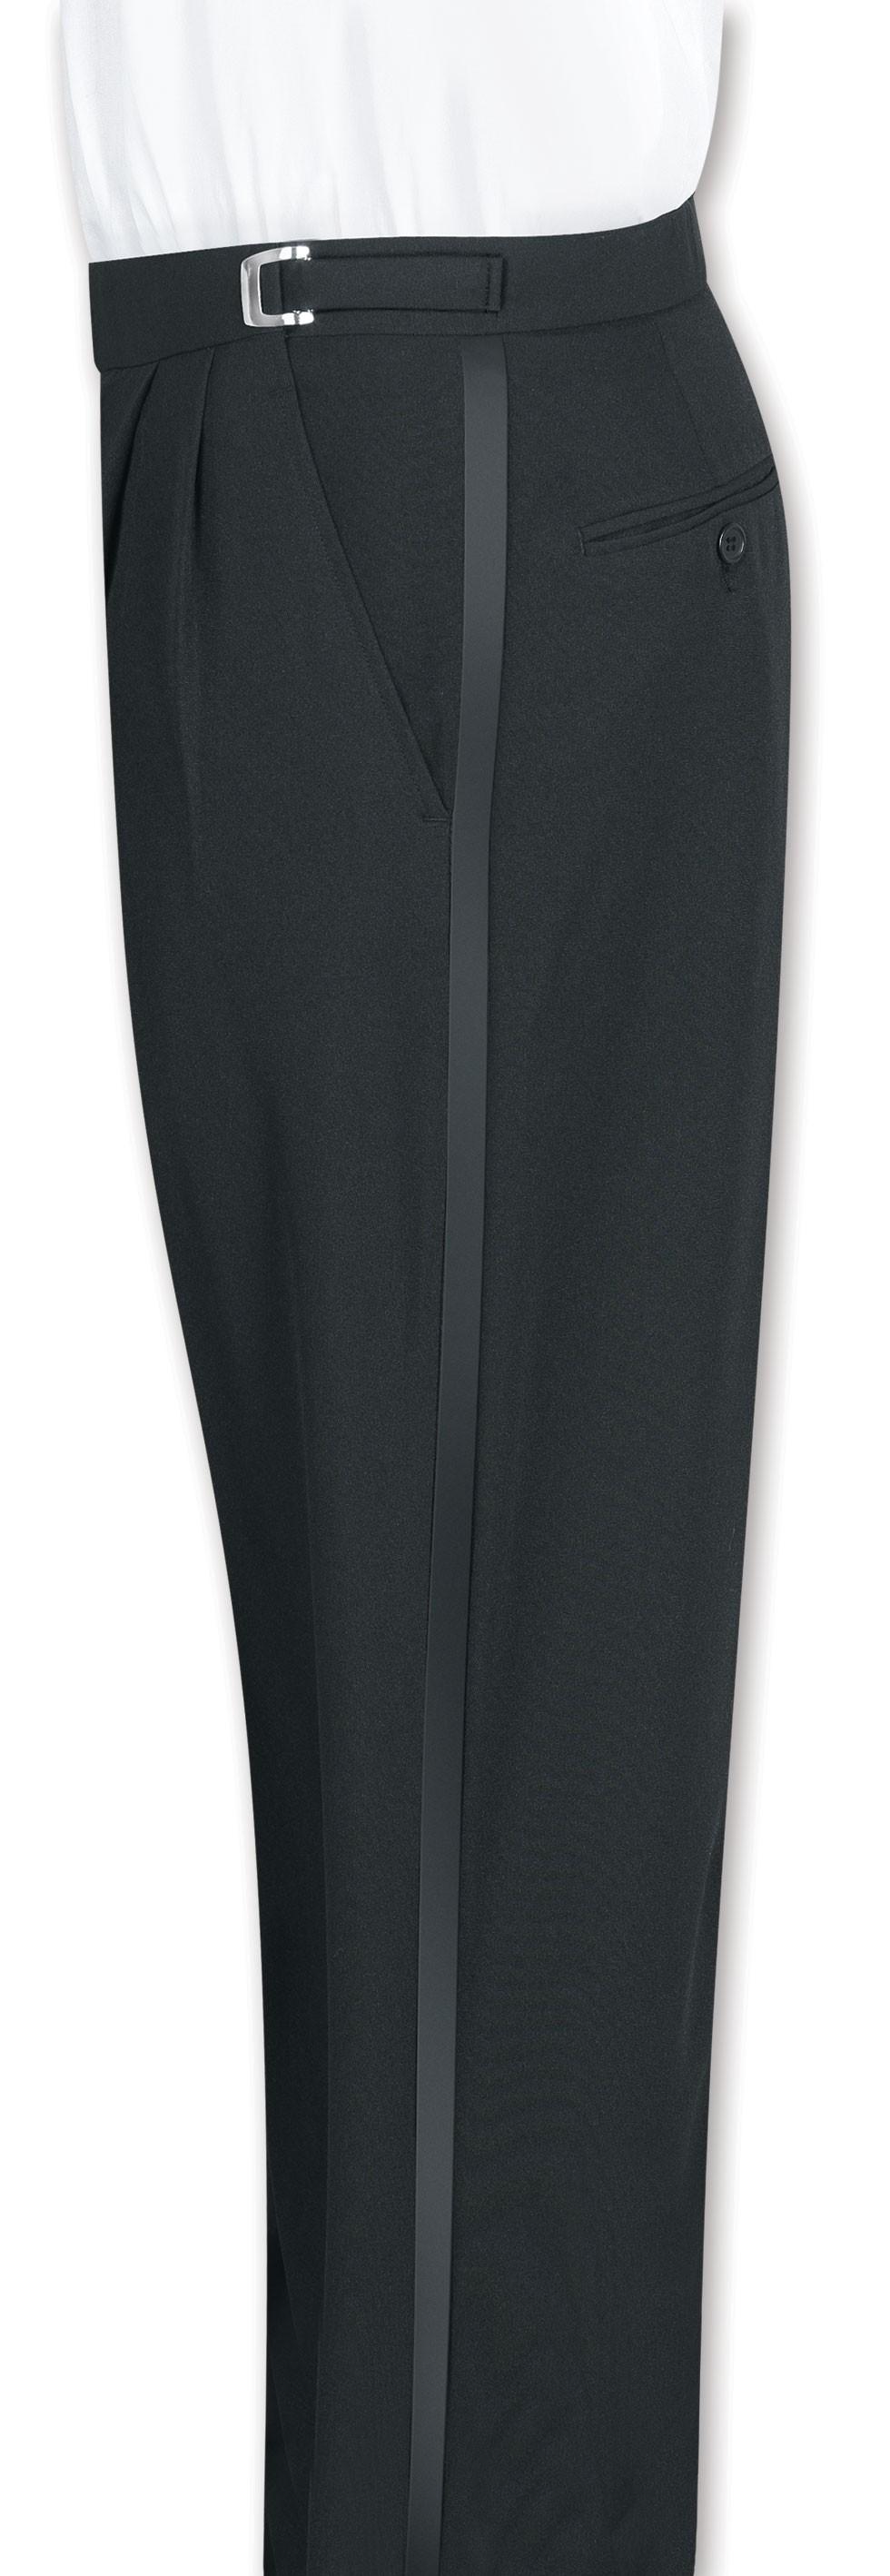 Henry Segal 9311 Men's Double-Pleated Front Adjustable-Waist Pants